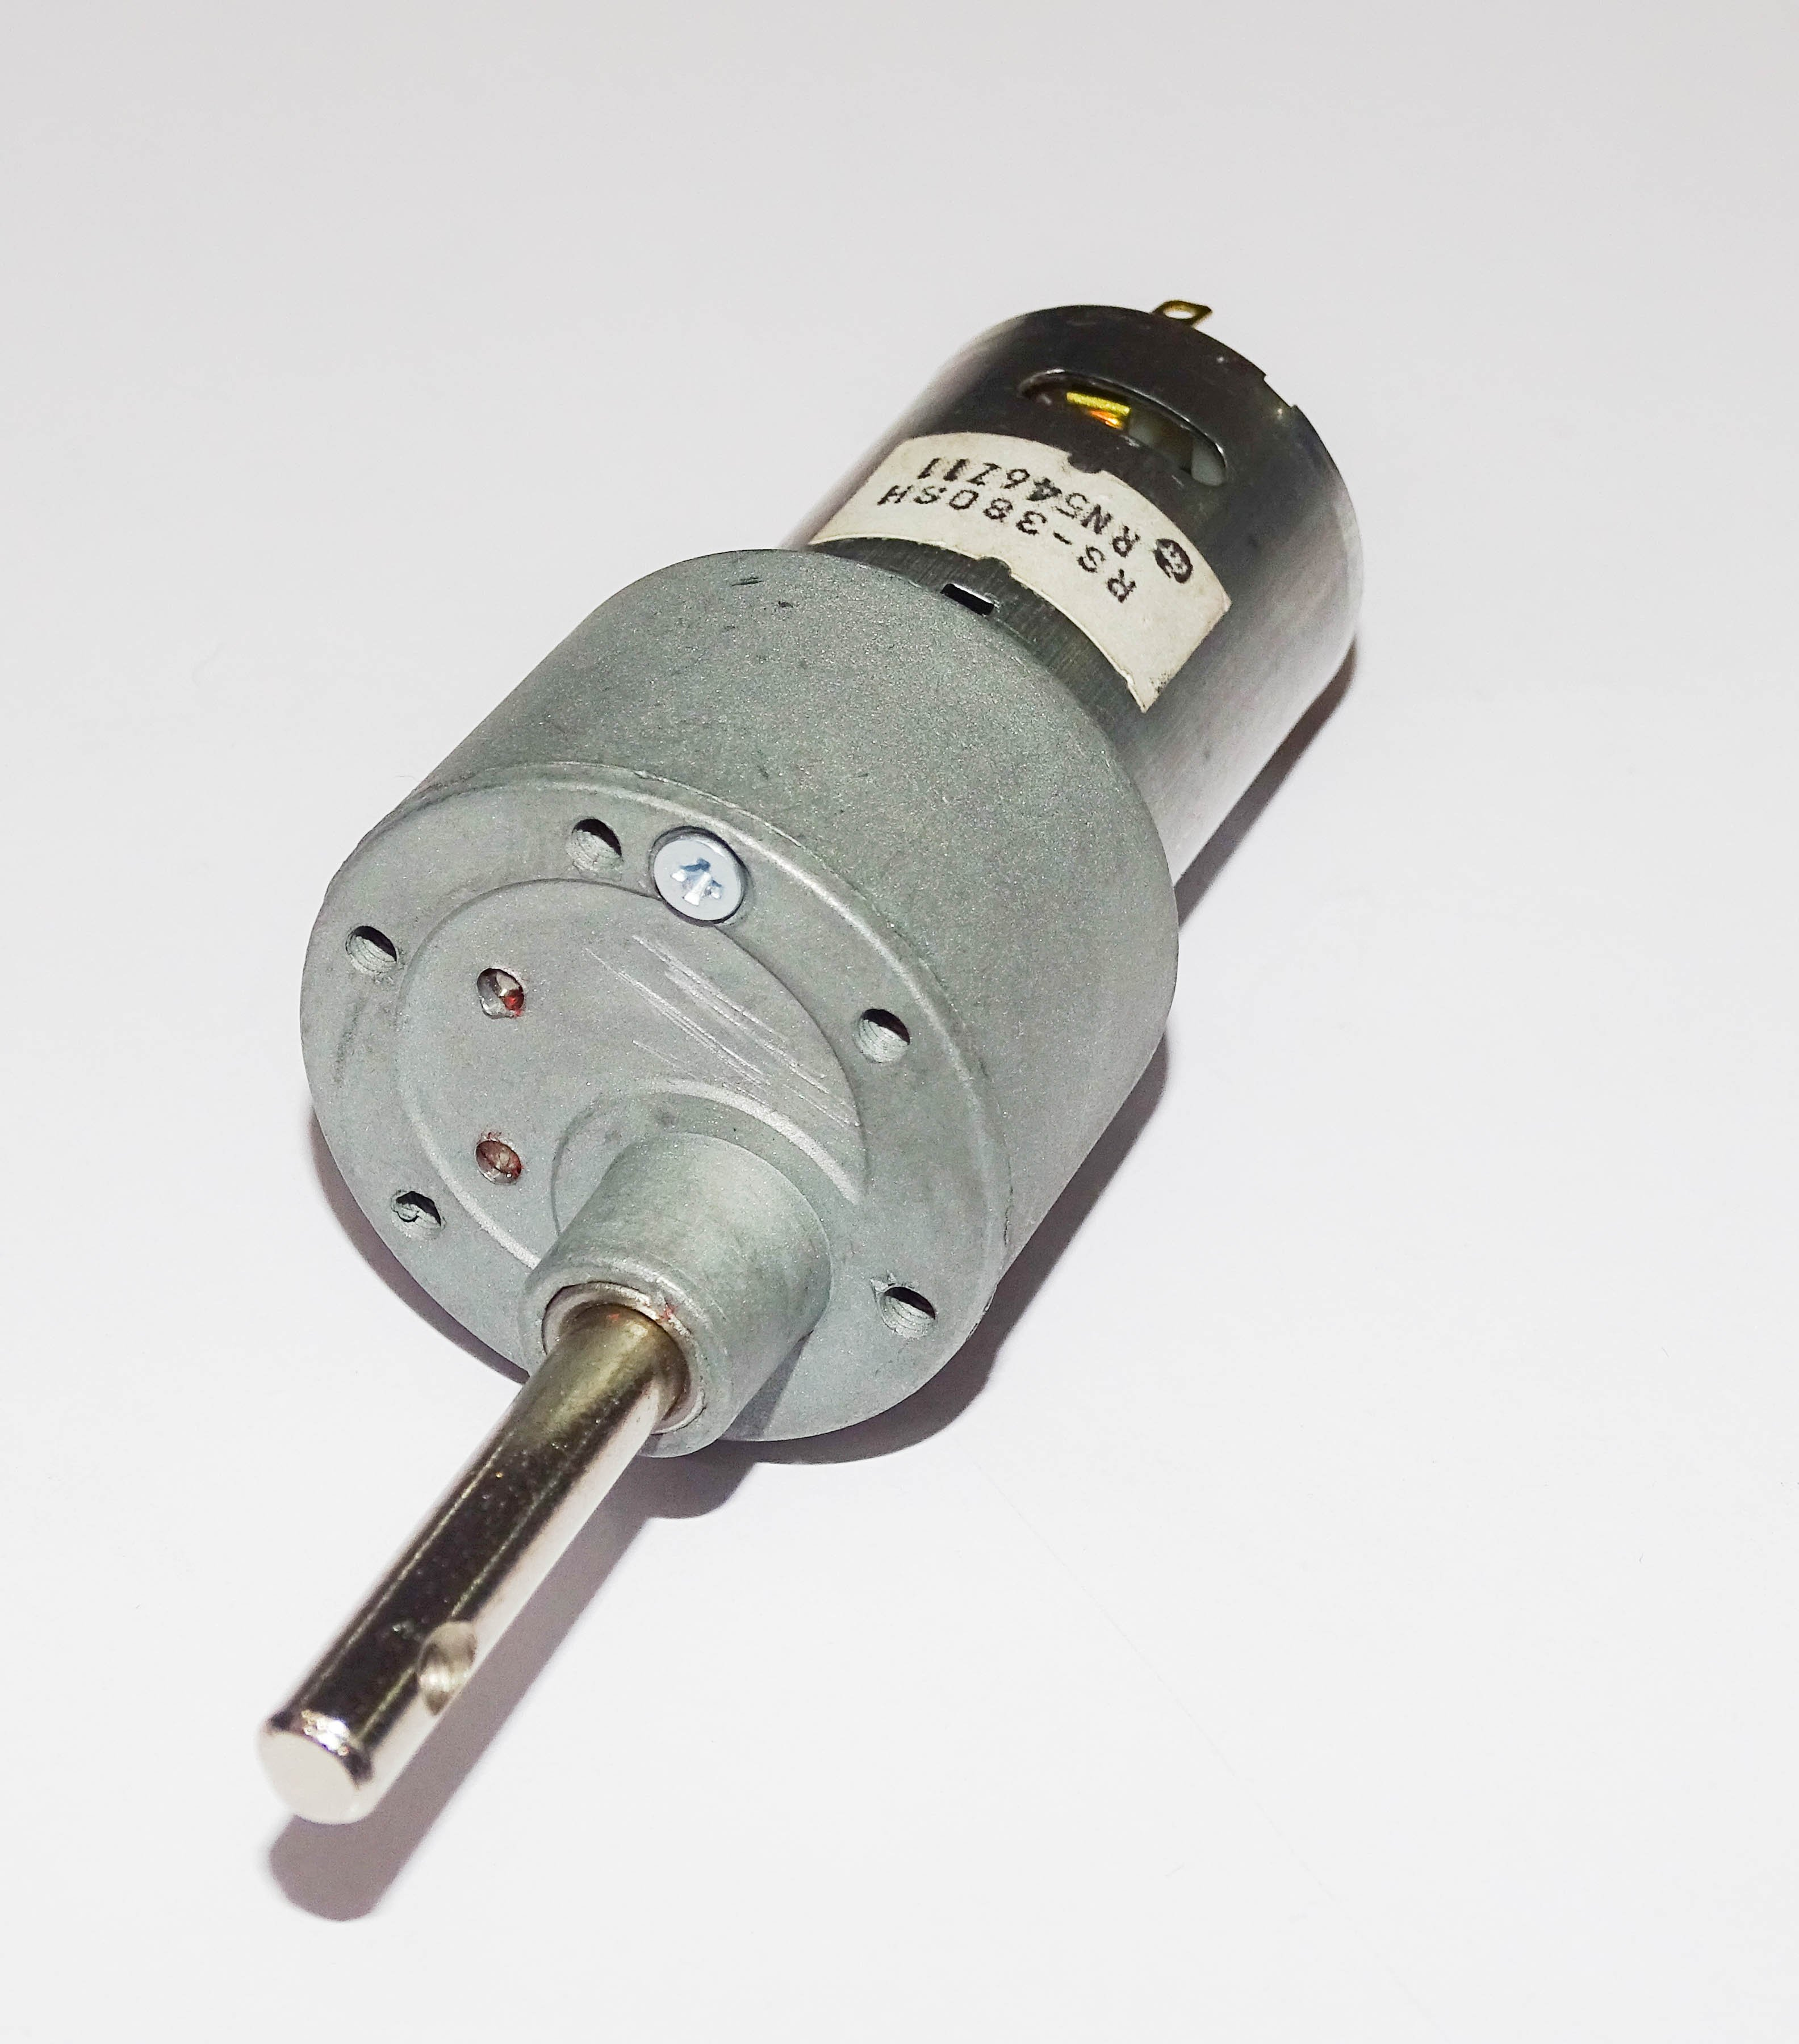 Johnson motor made in india 12 v dc 500 rpm ebay for Gear motor 500 rpm